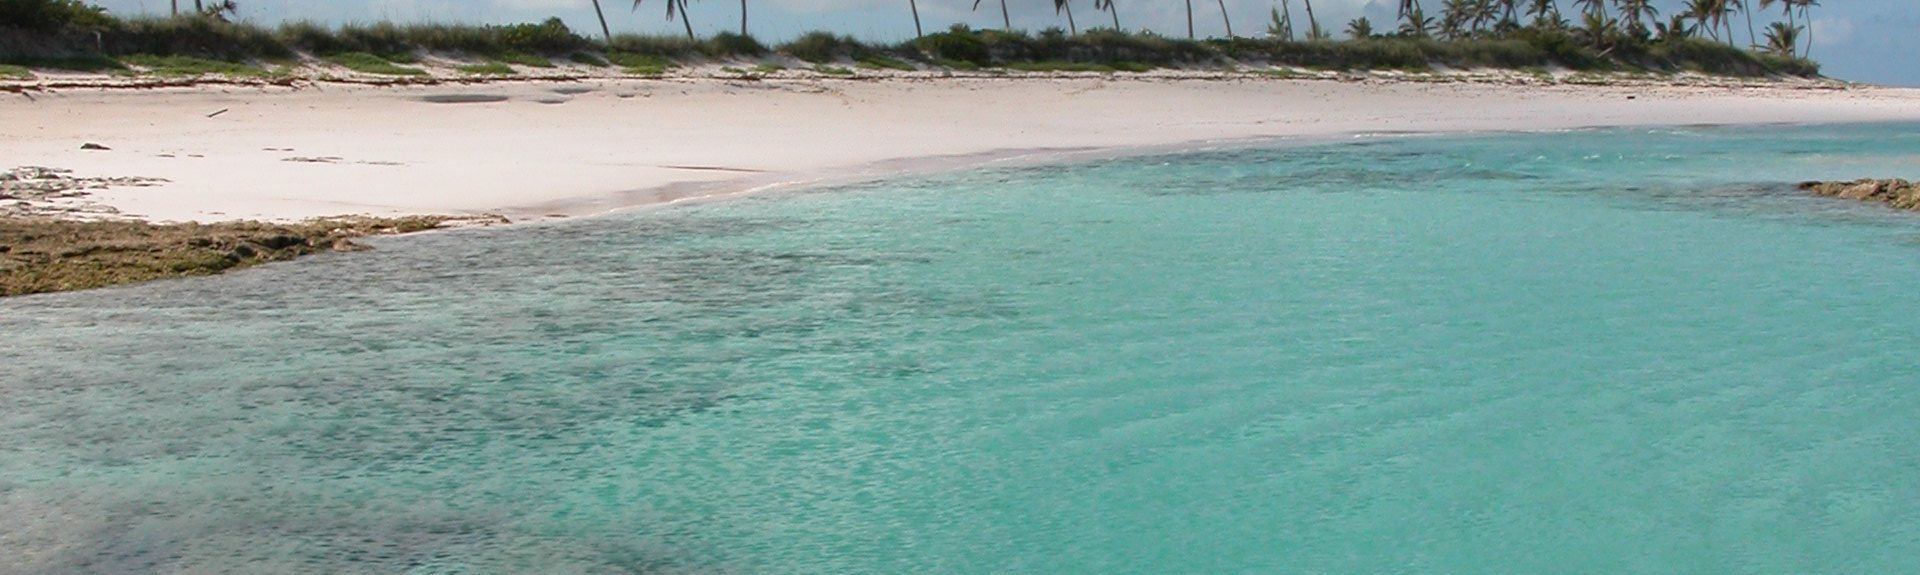 Winding Bay, Tarpum Bay, Eleuthera Island, Bahamas